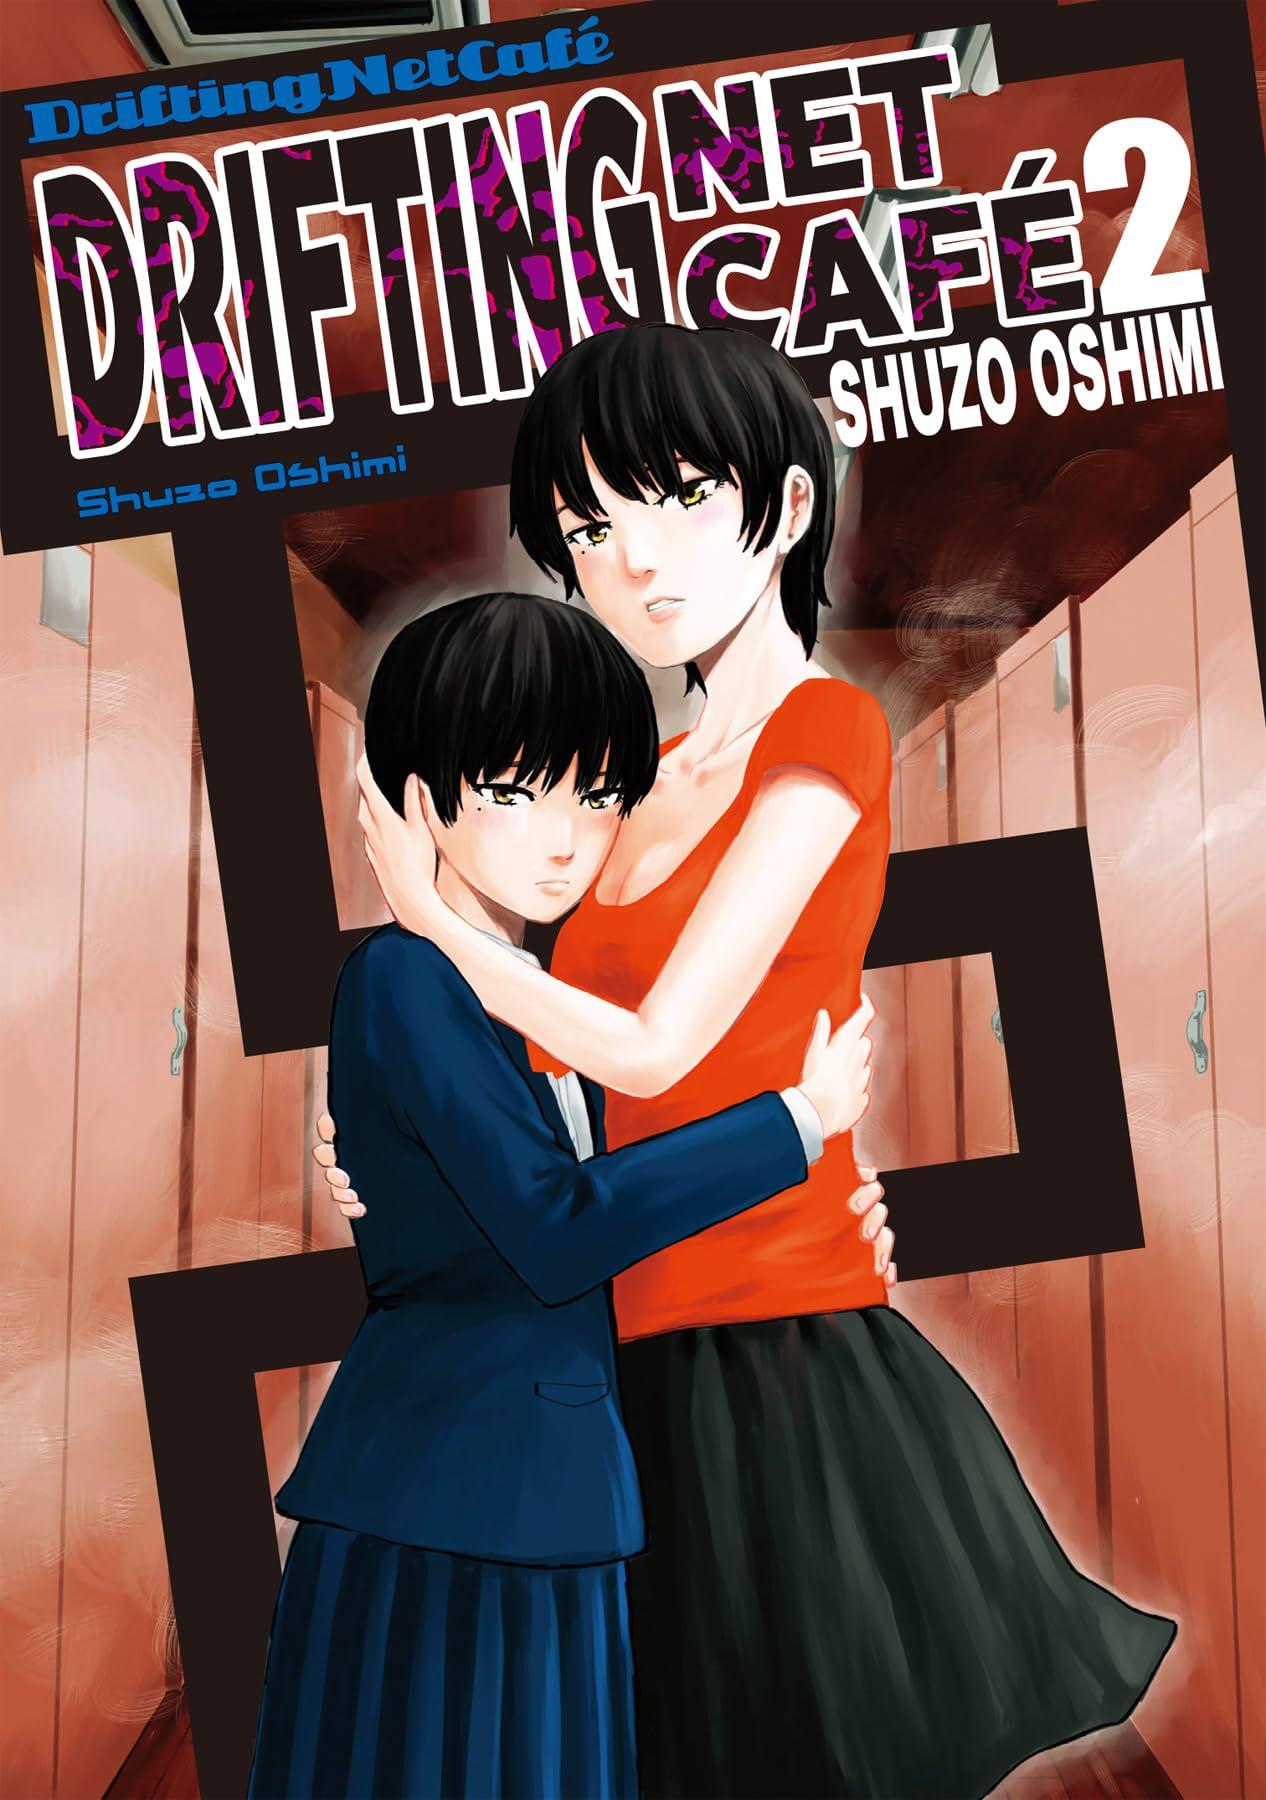 Drifting Net Cafe Vol. 2